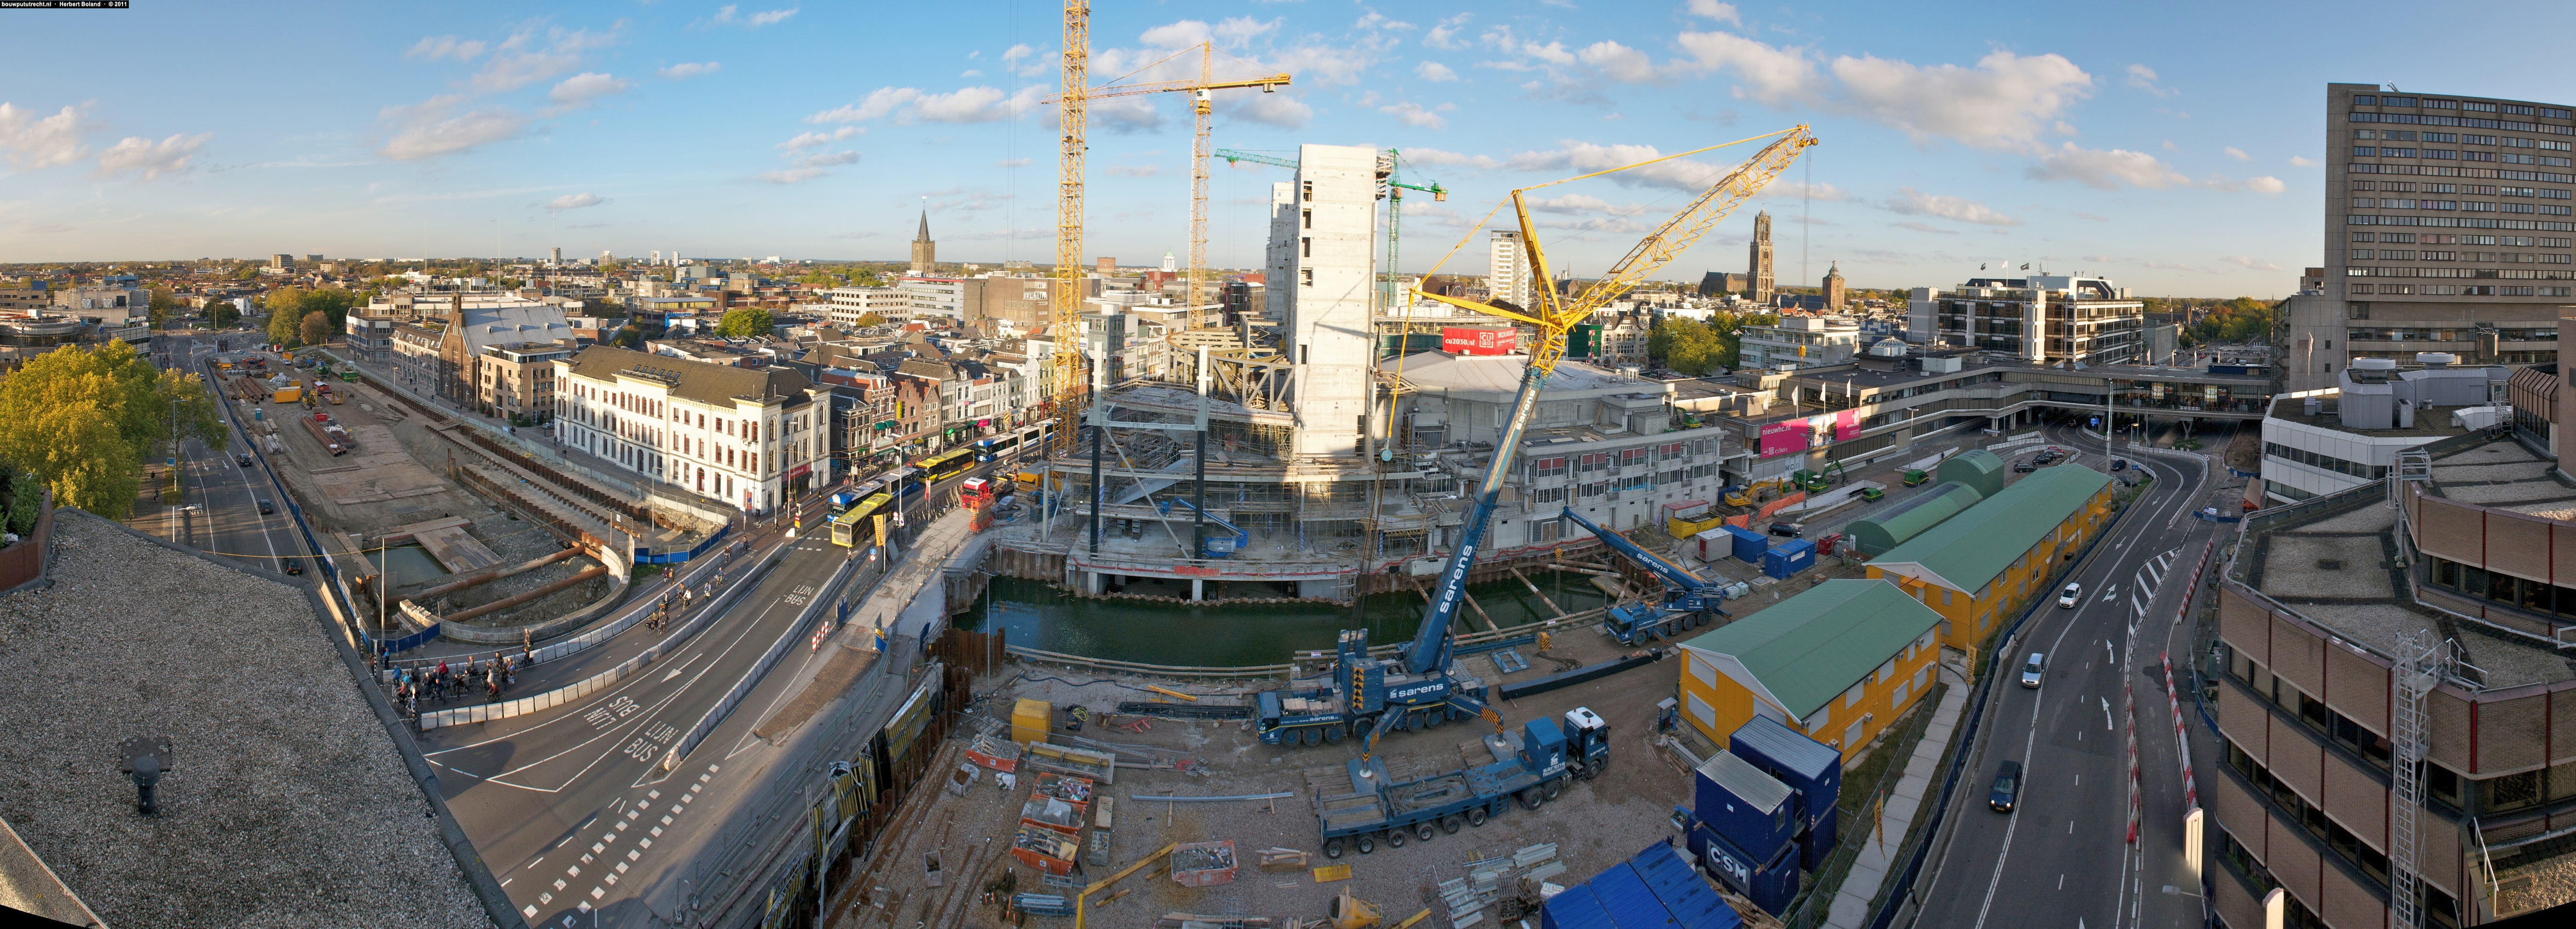 PanoramaMuziekpaleis_HBoland_BouwputUtrecht_okt2011